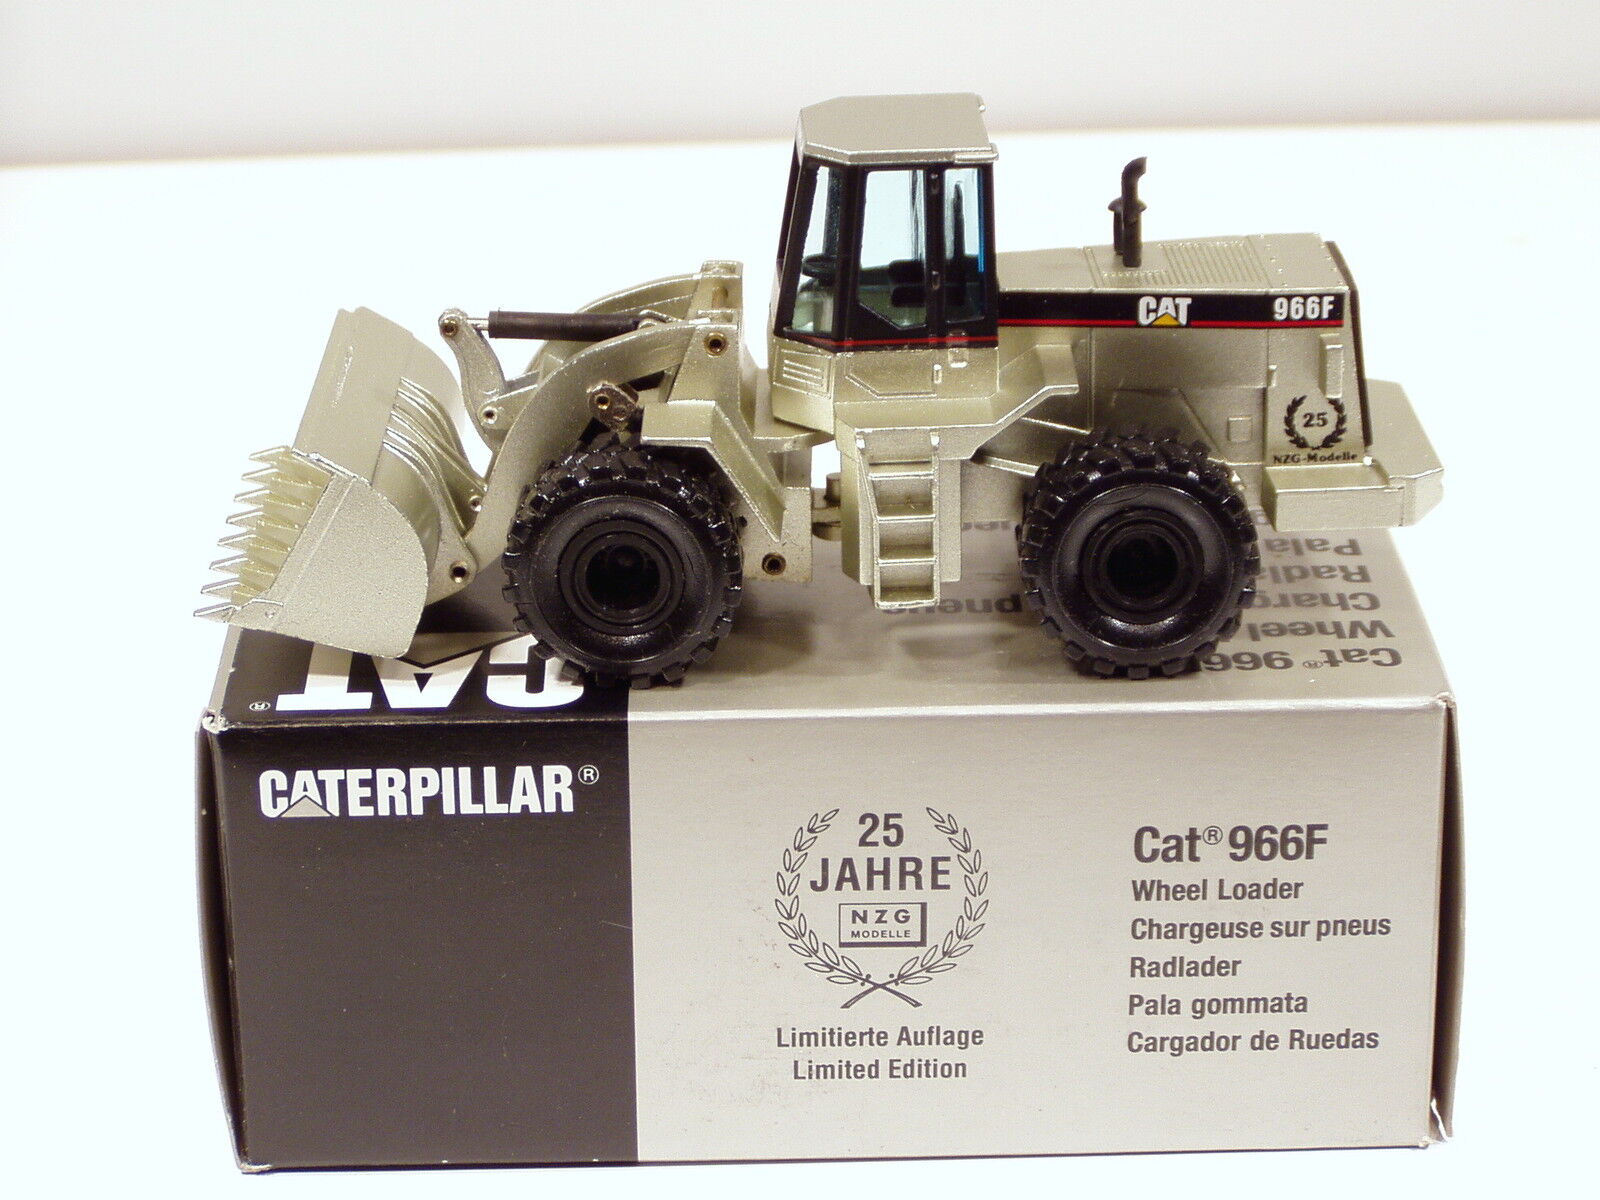 Caterpillar 966F Loader -  PALE oro  - 1 50 - NZG  237 - MIB